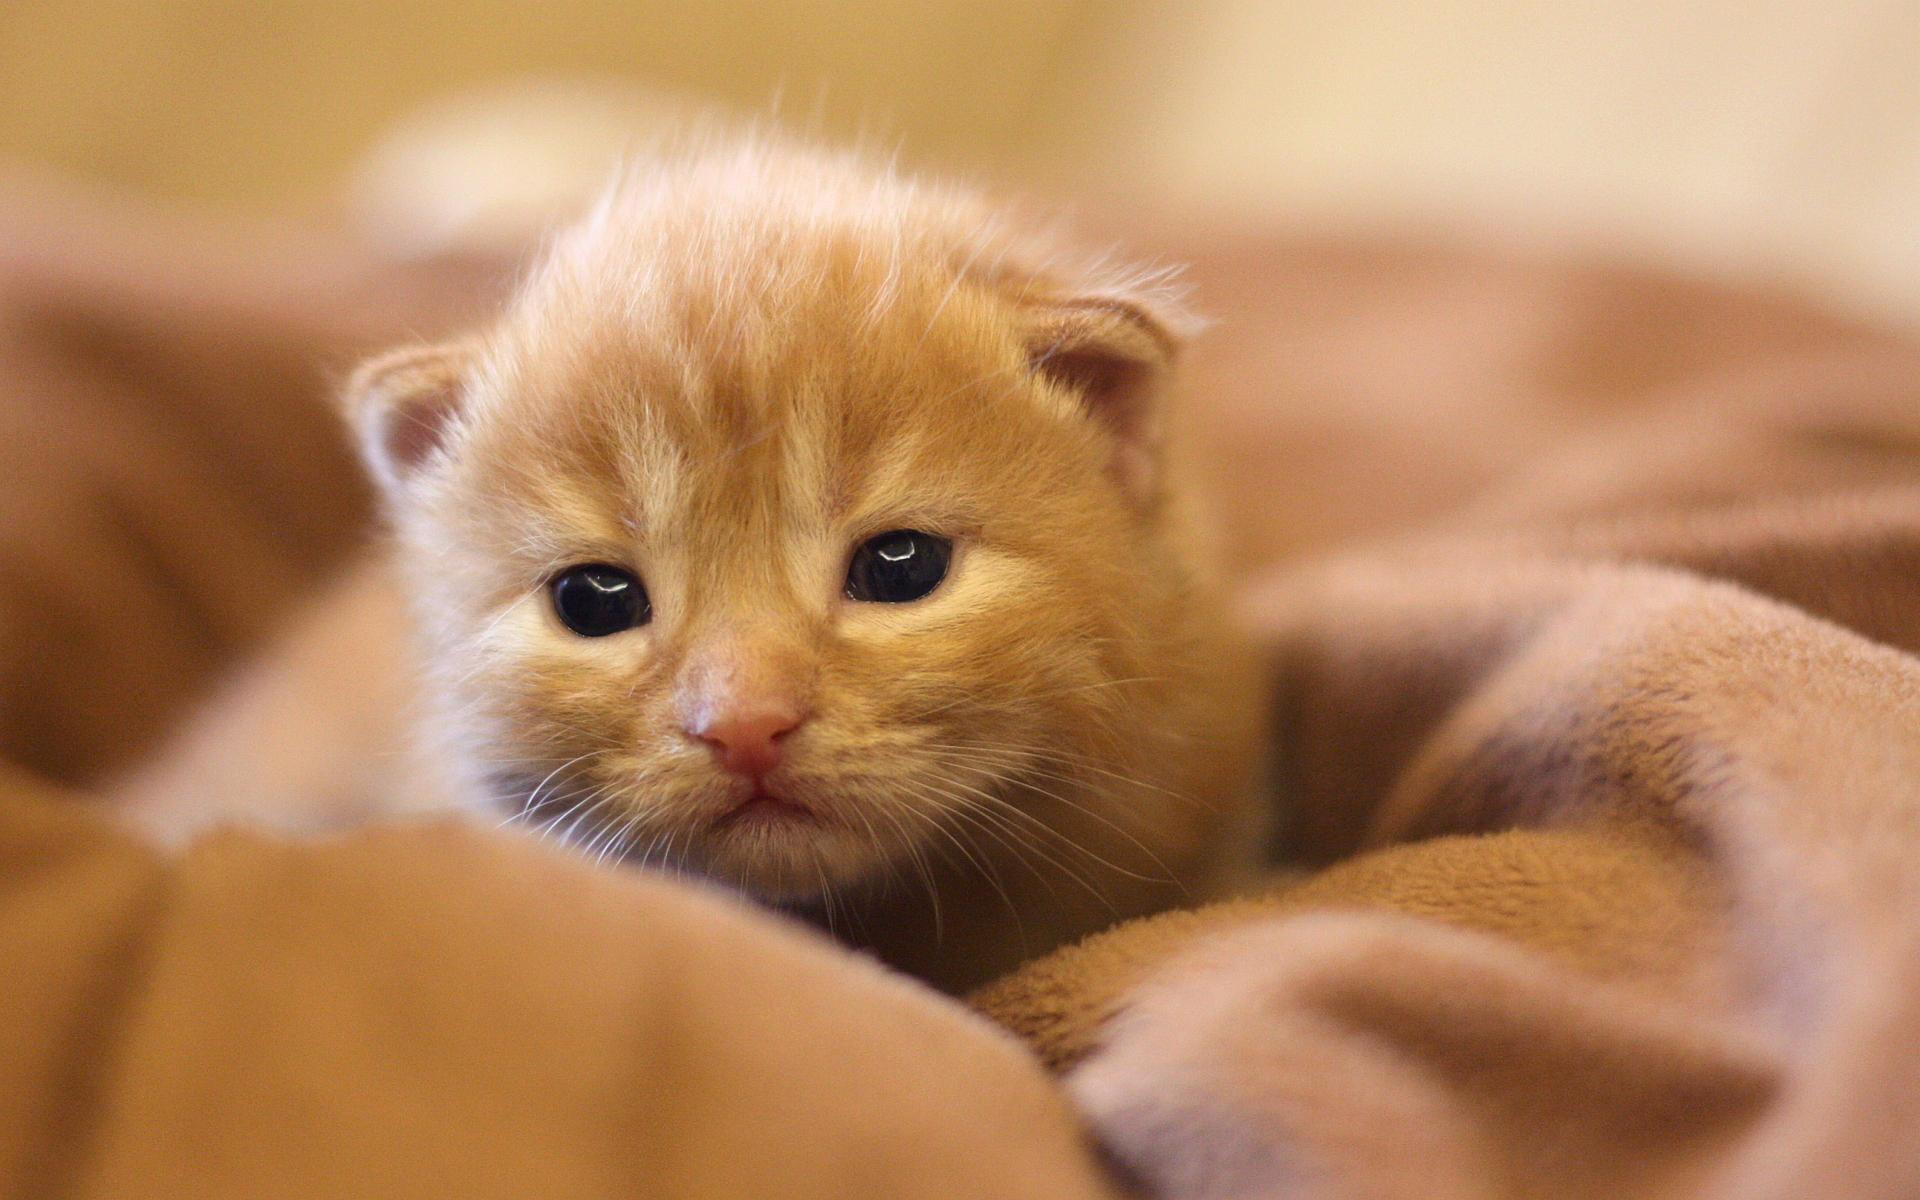 hd wallpaper kitty - photo #2